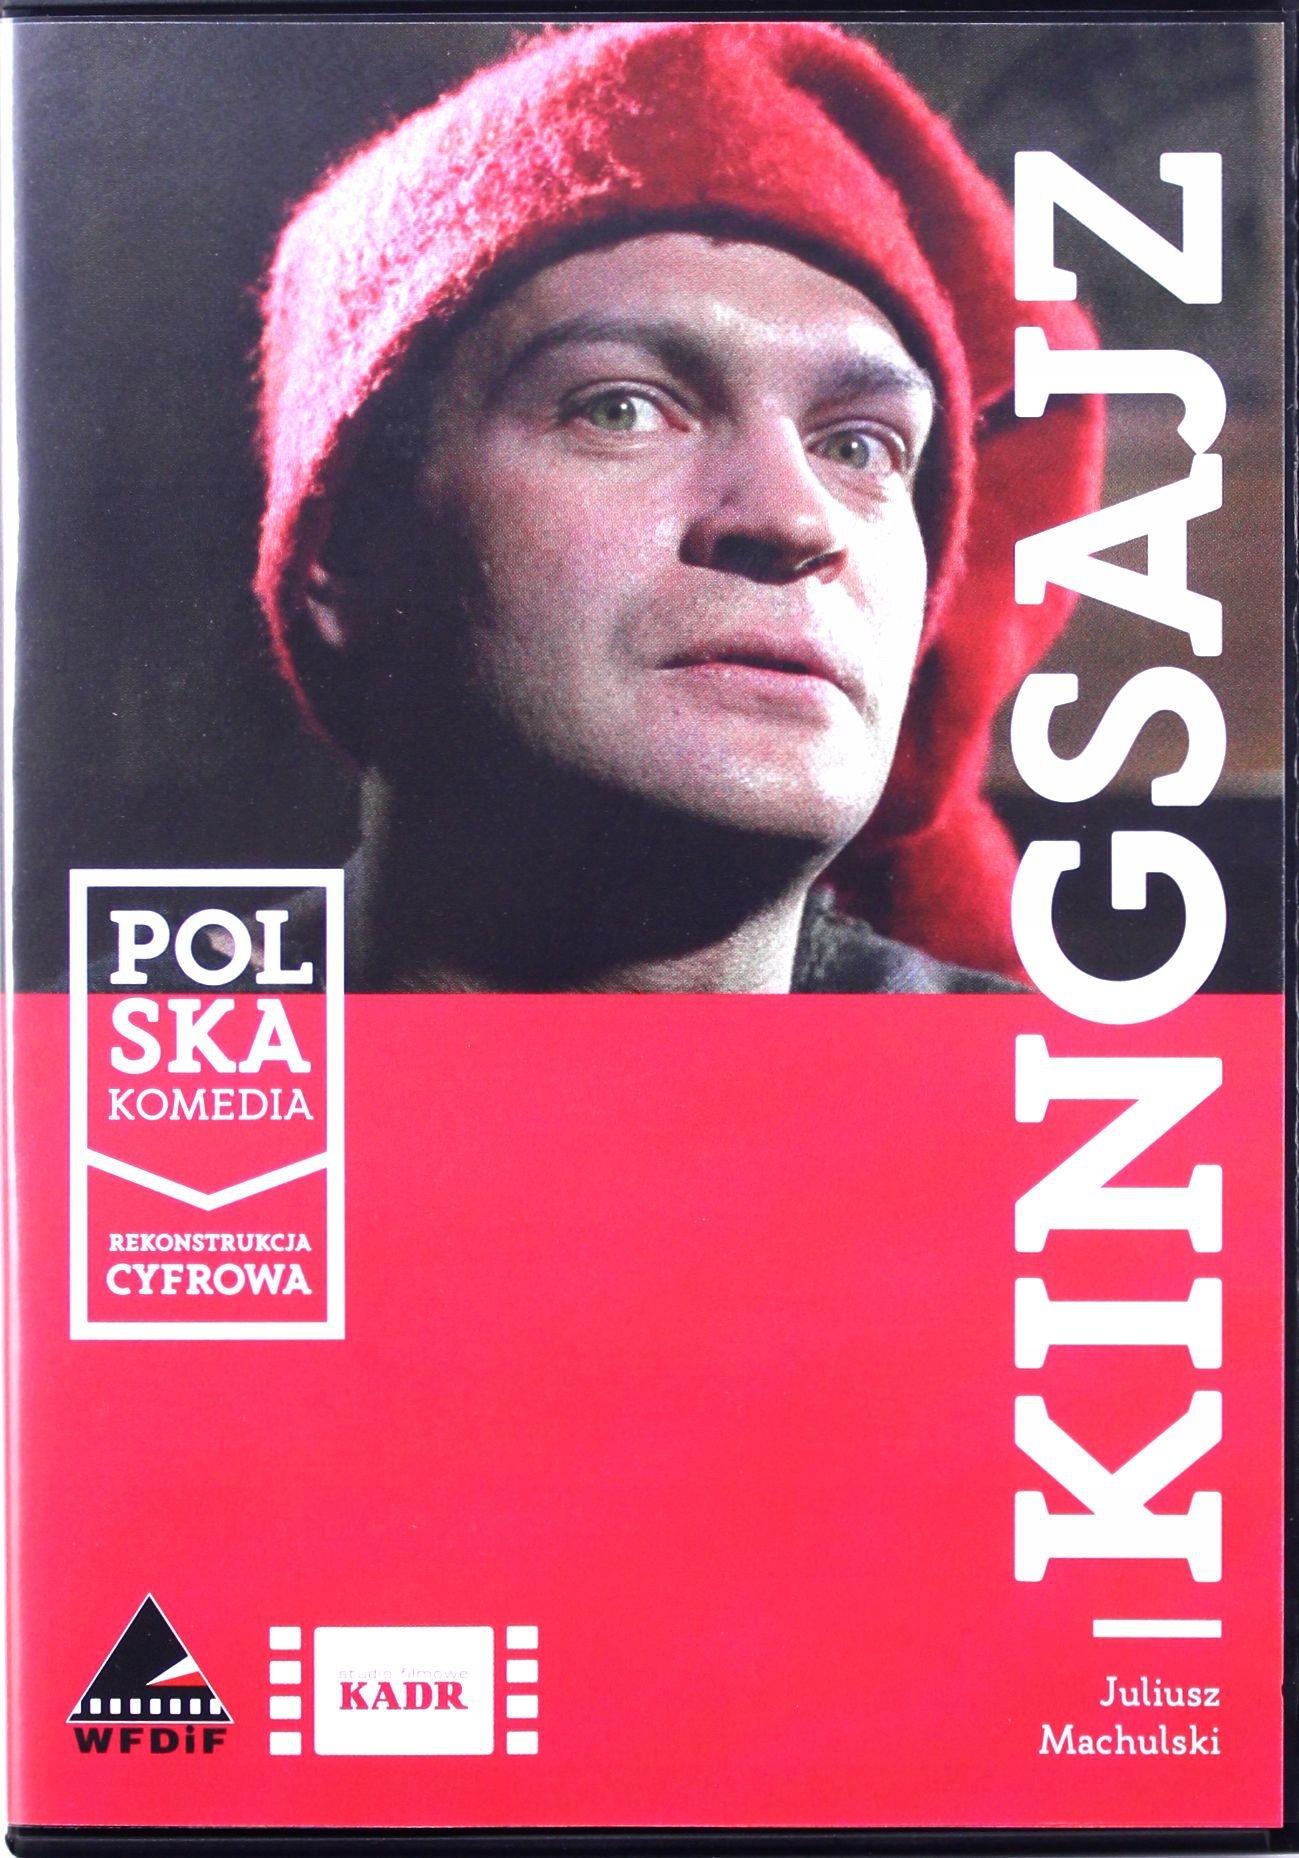 Kingsajz (rekonstrukcja Cyfrowa) (DVD)